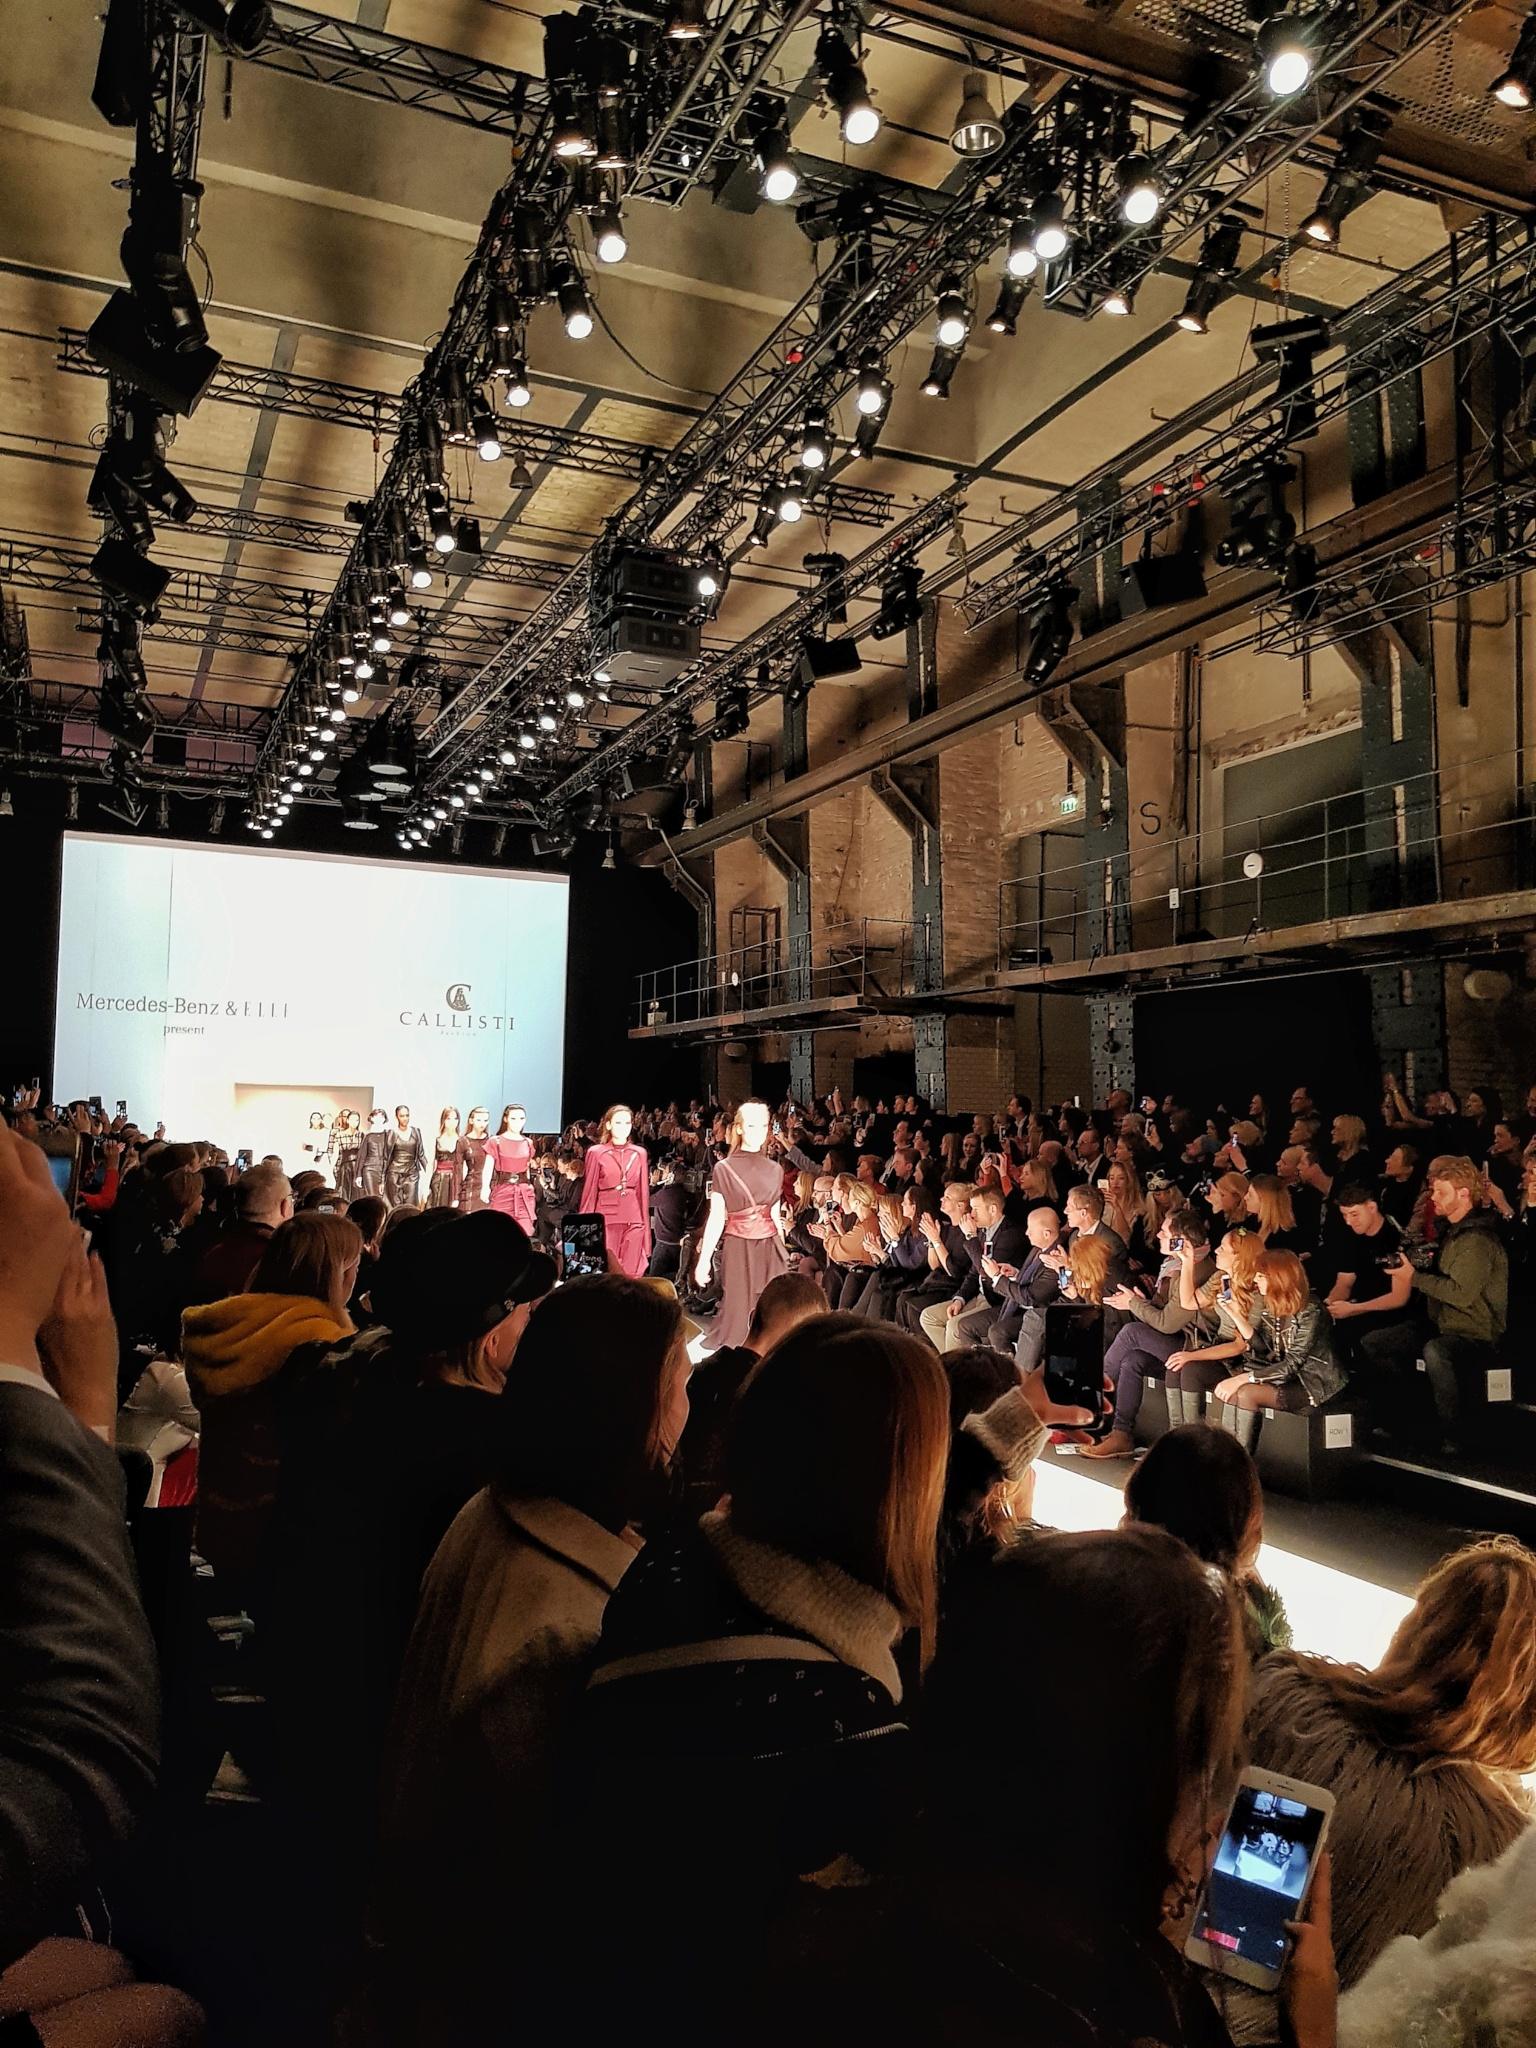 Callistri show Berlin